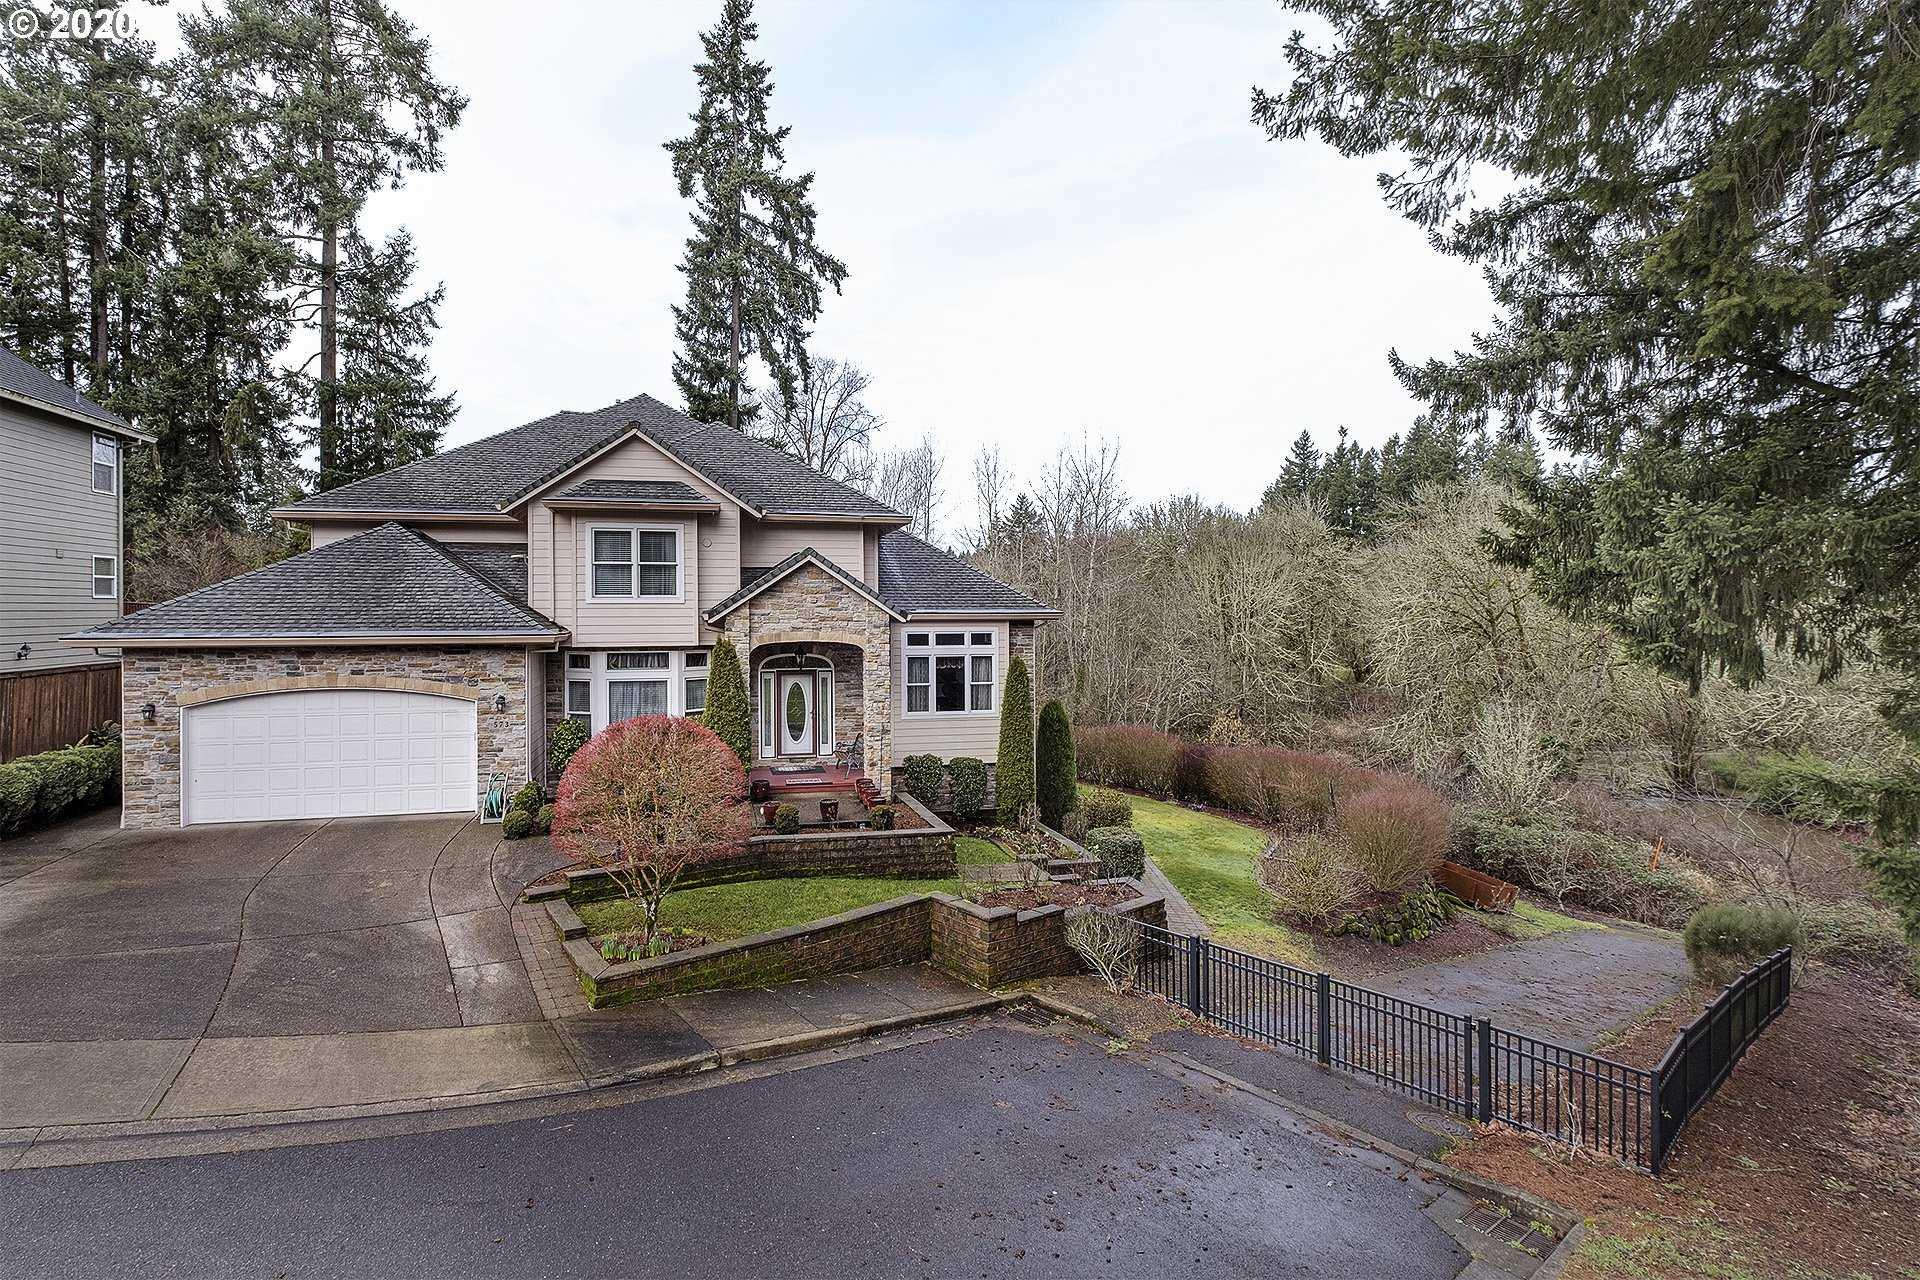 $1,220,000 - 5Br/5Ba -  for Sale in Hillsboro